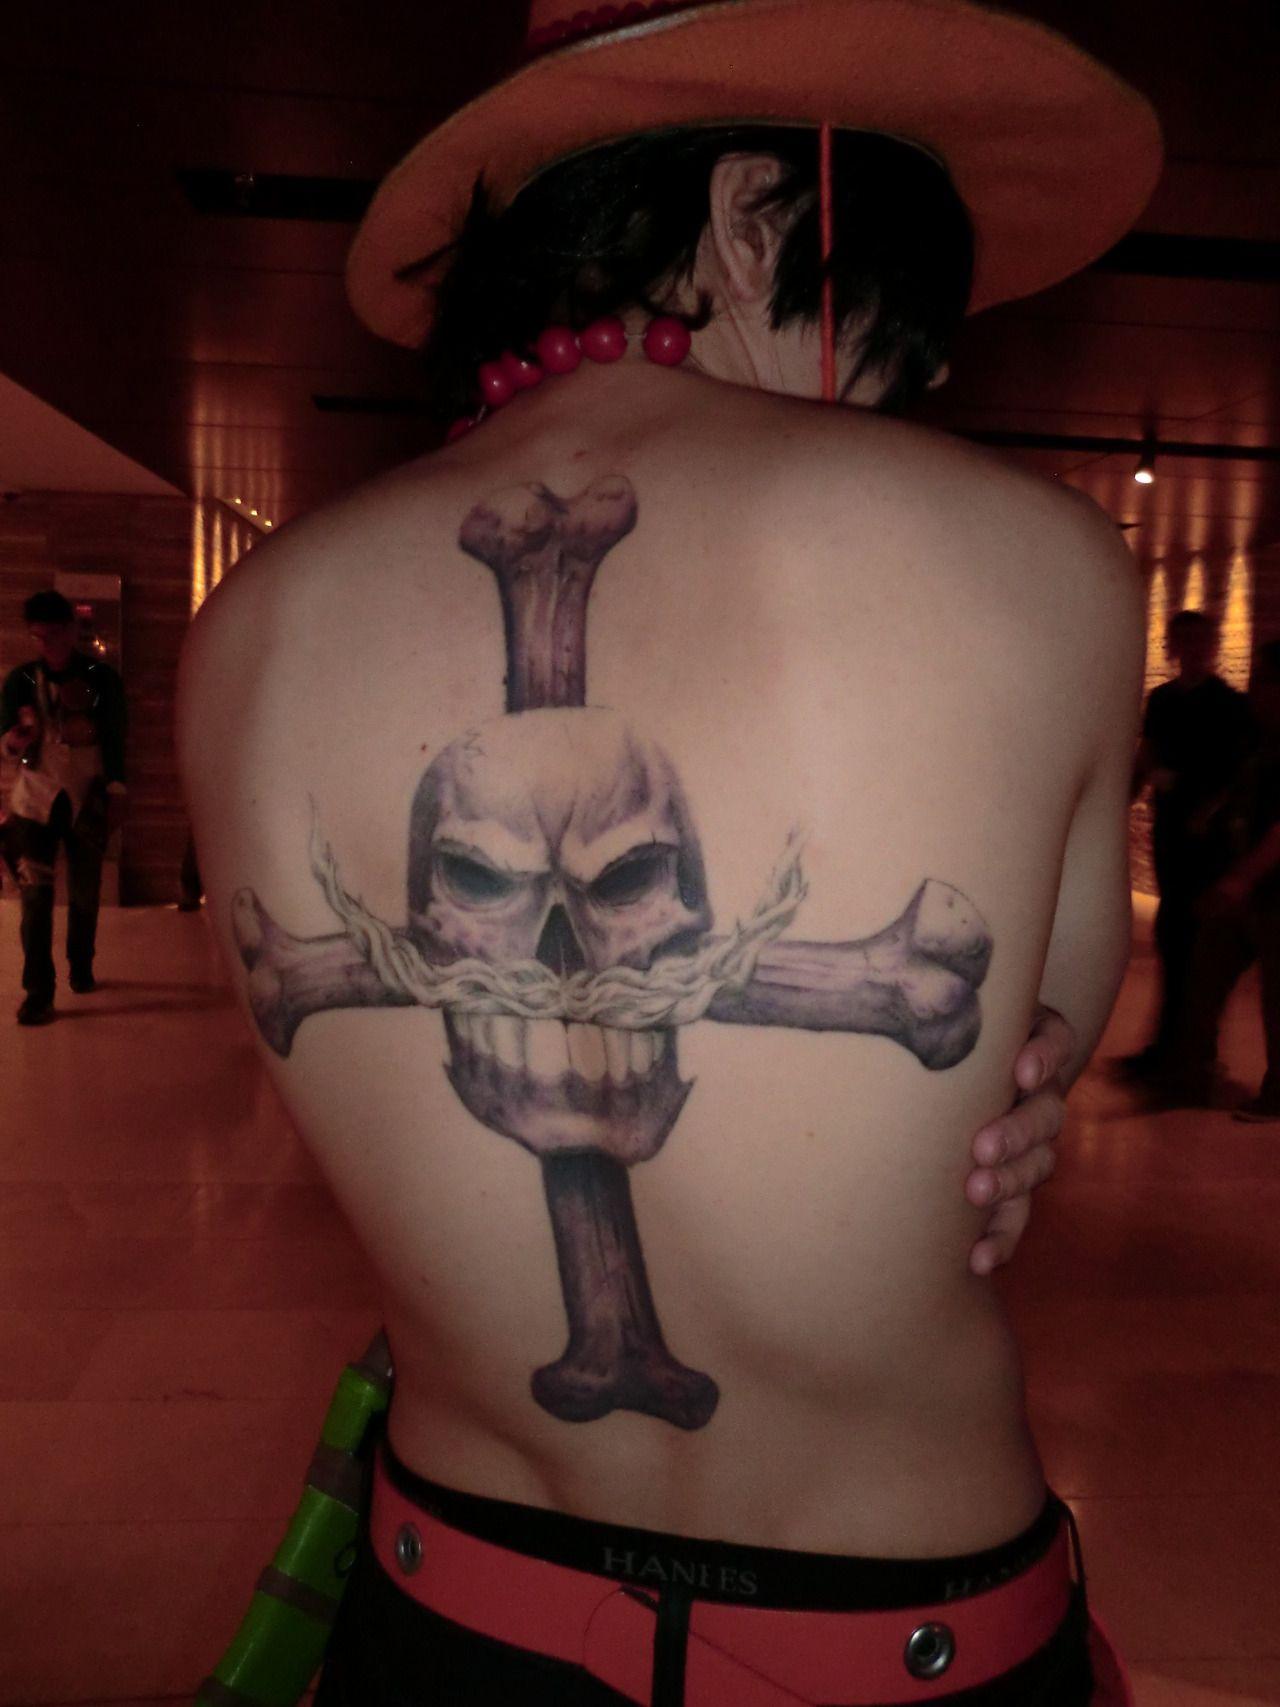 One Piece Tattoo Tattoos Piercings One Piece Tattoos Tattoos